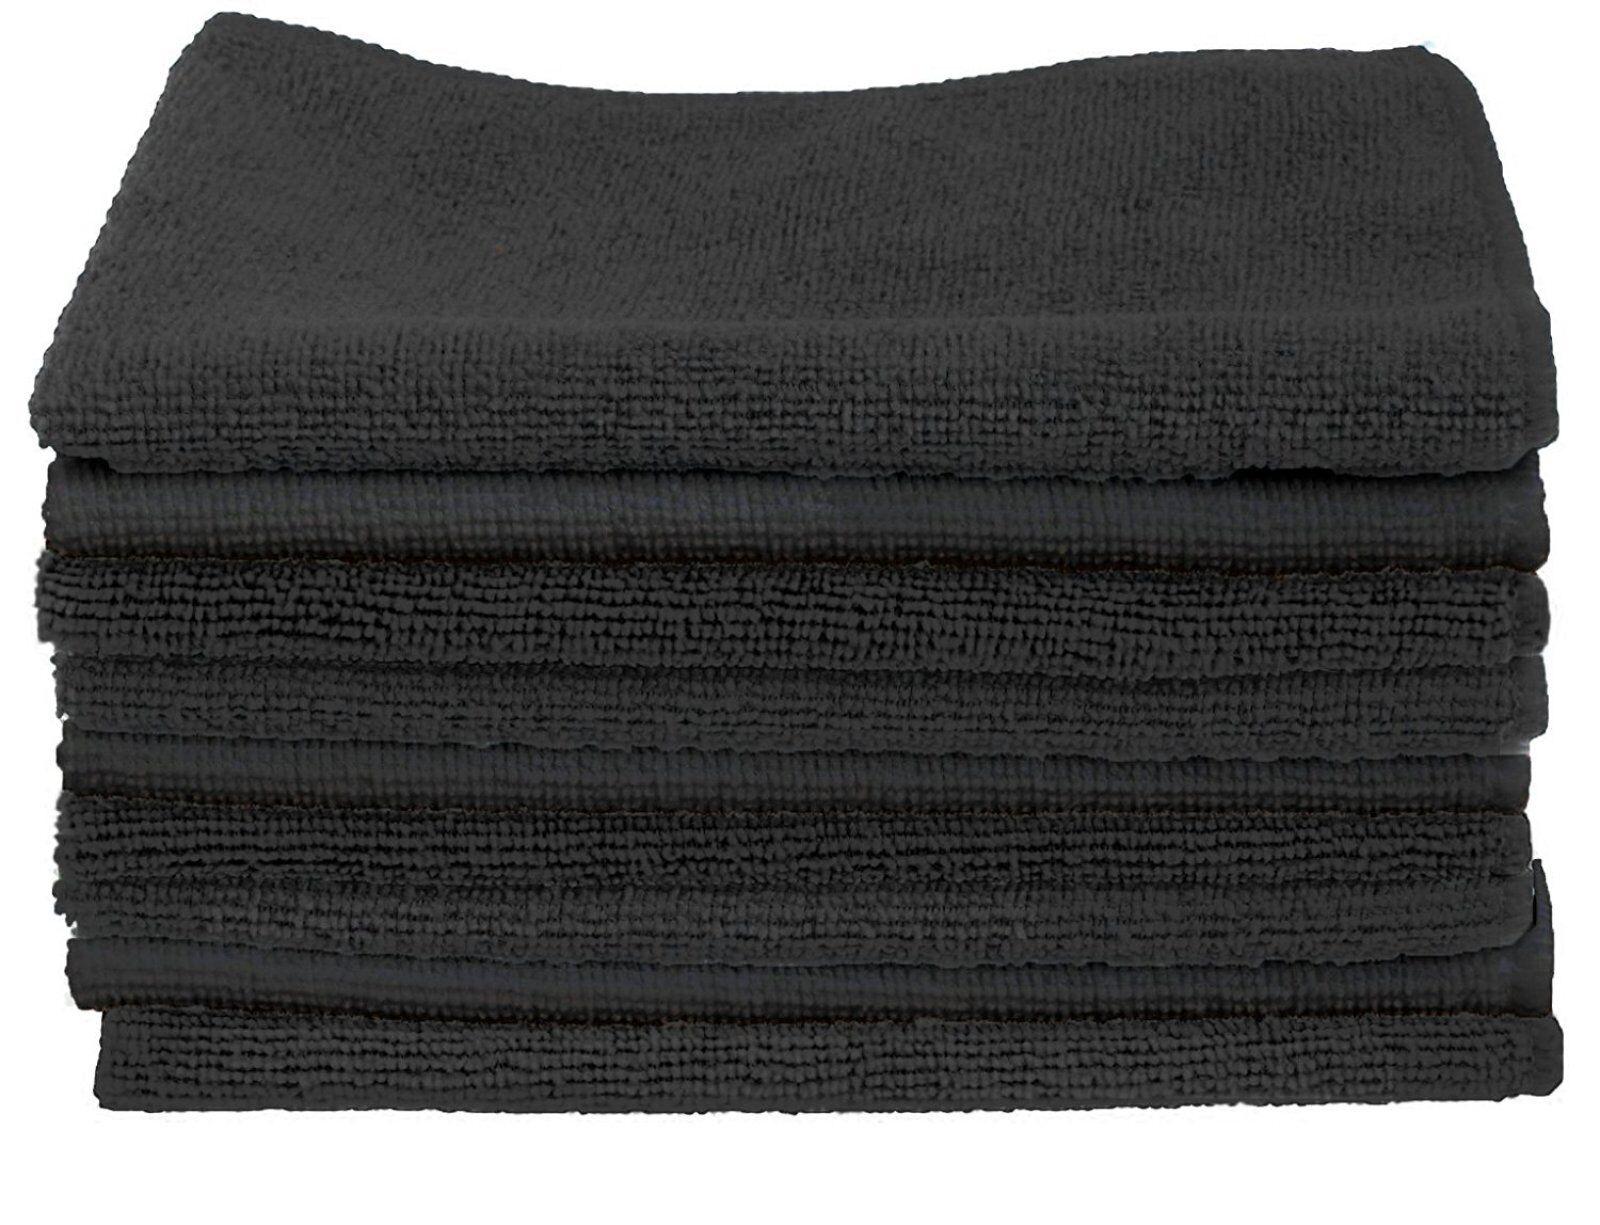 Microfiber Cleaning Cloth 30 Pcs Polishing Car Towel Kitchen Rugs 14x14in Black